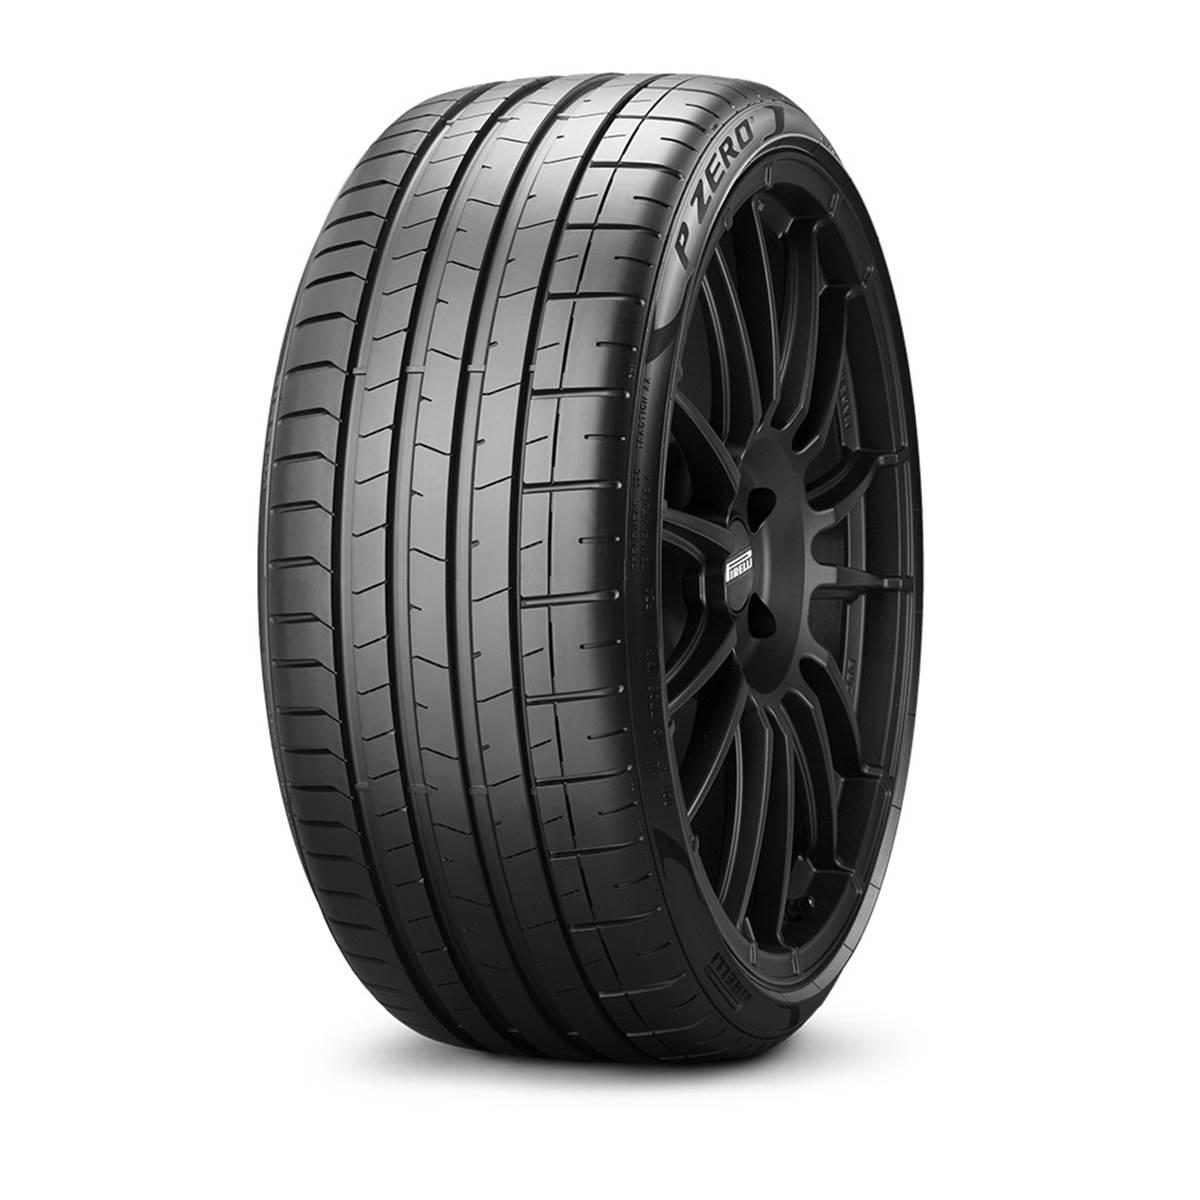 Pneu Pirelli 355/30R19 99Y P Zero